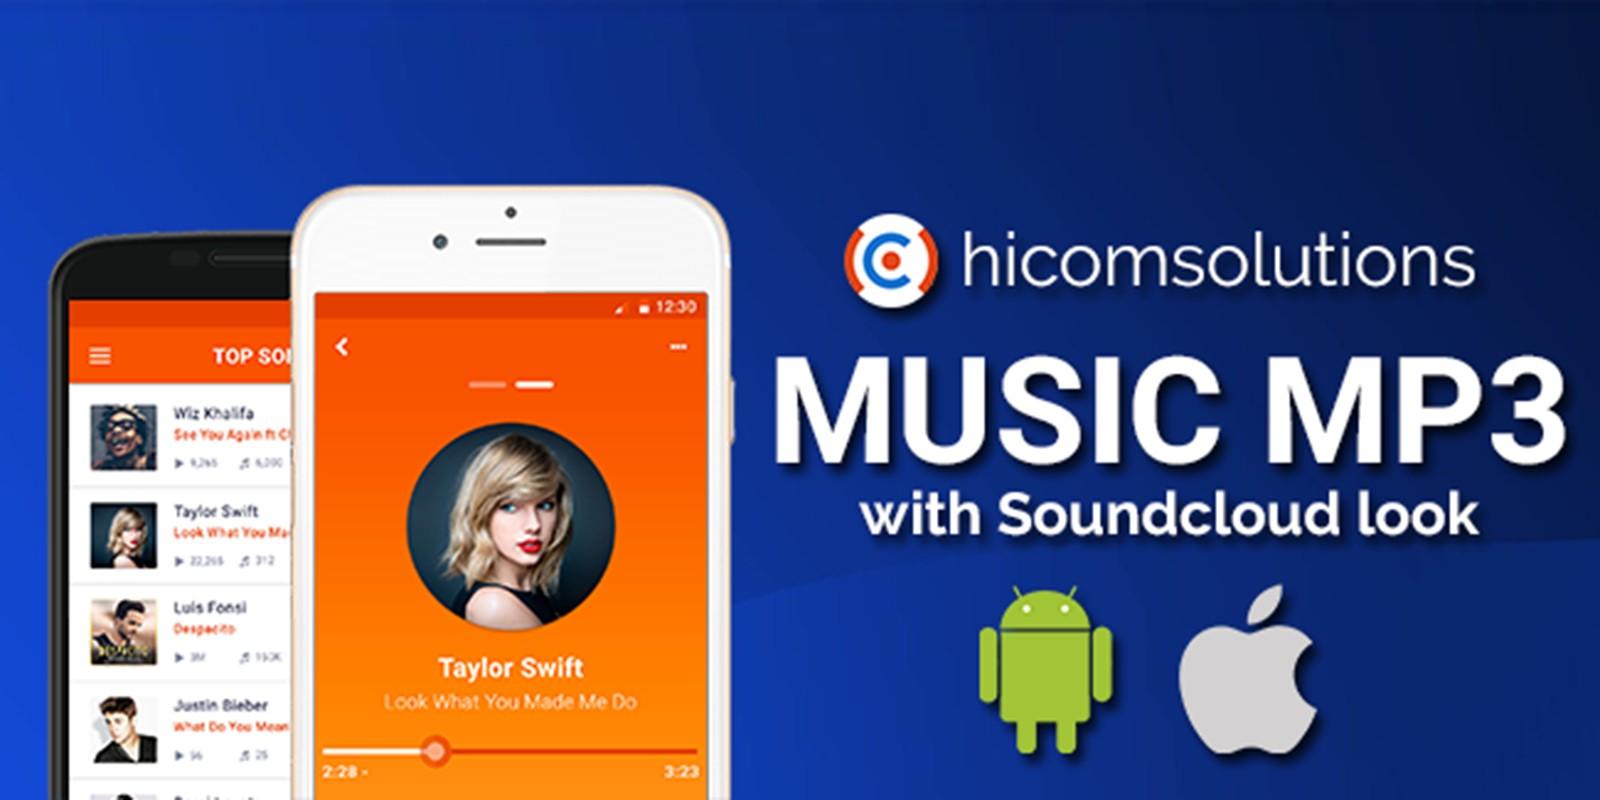 Music MP3 - iOS App Source Code